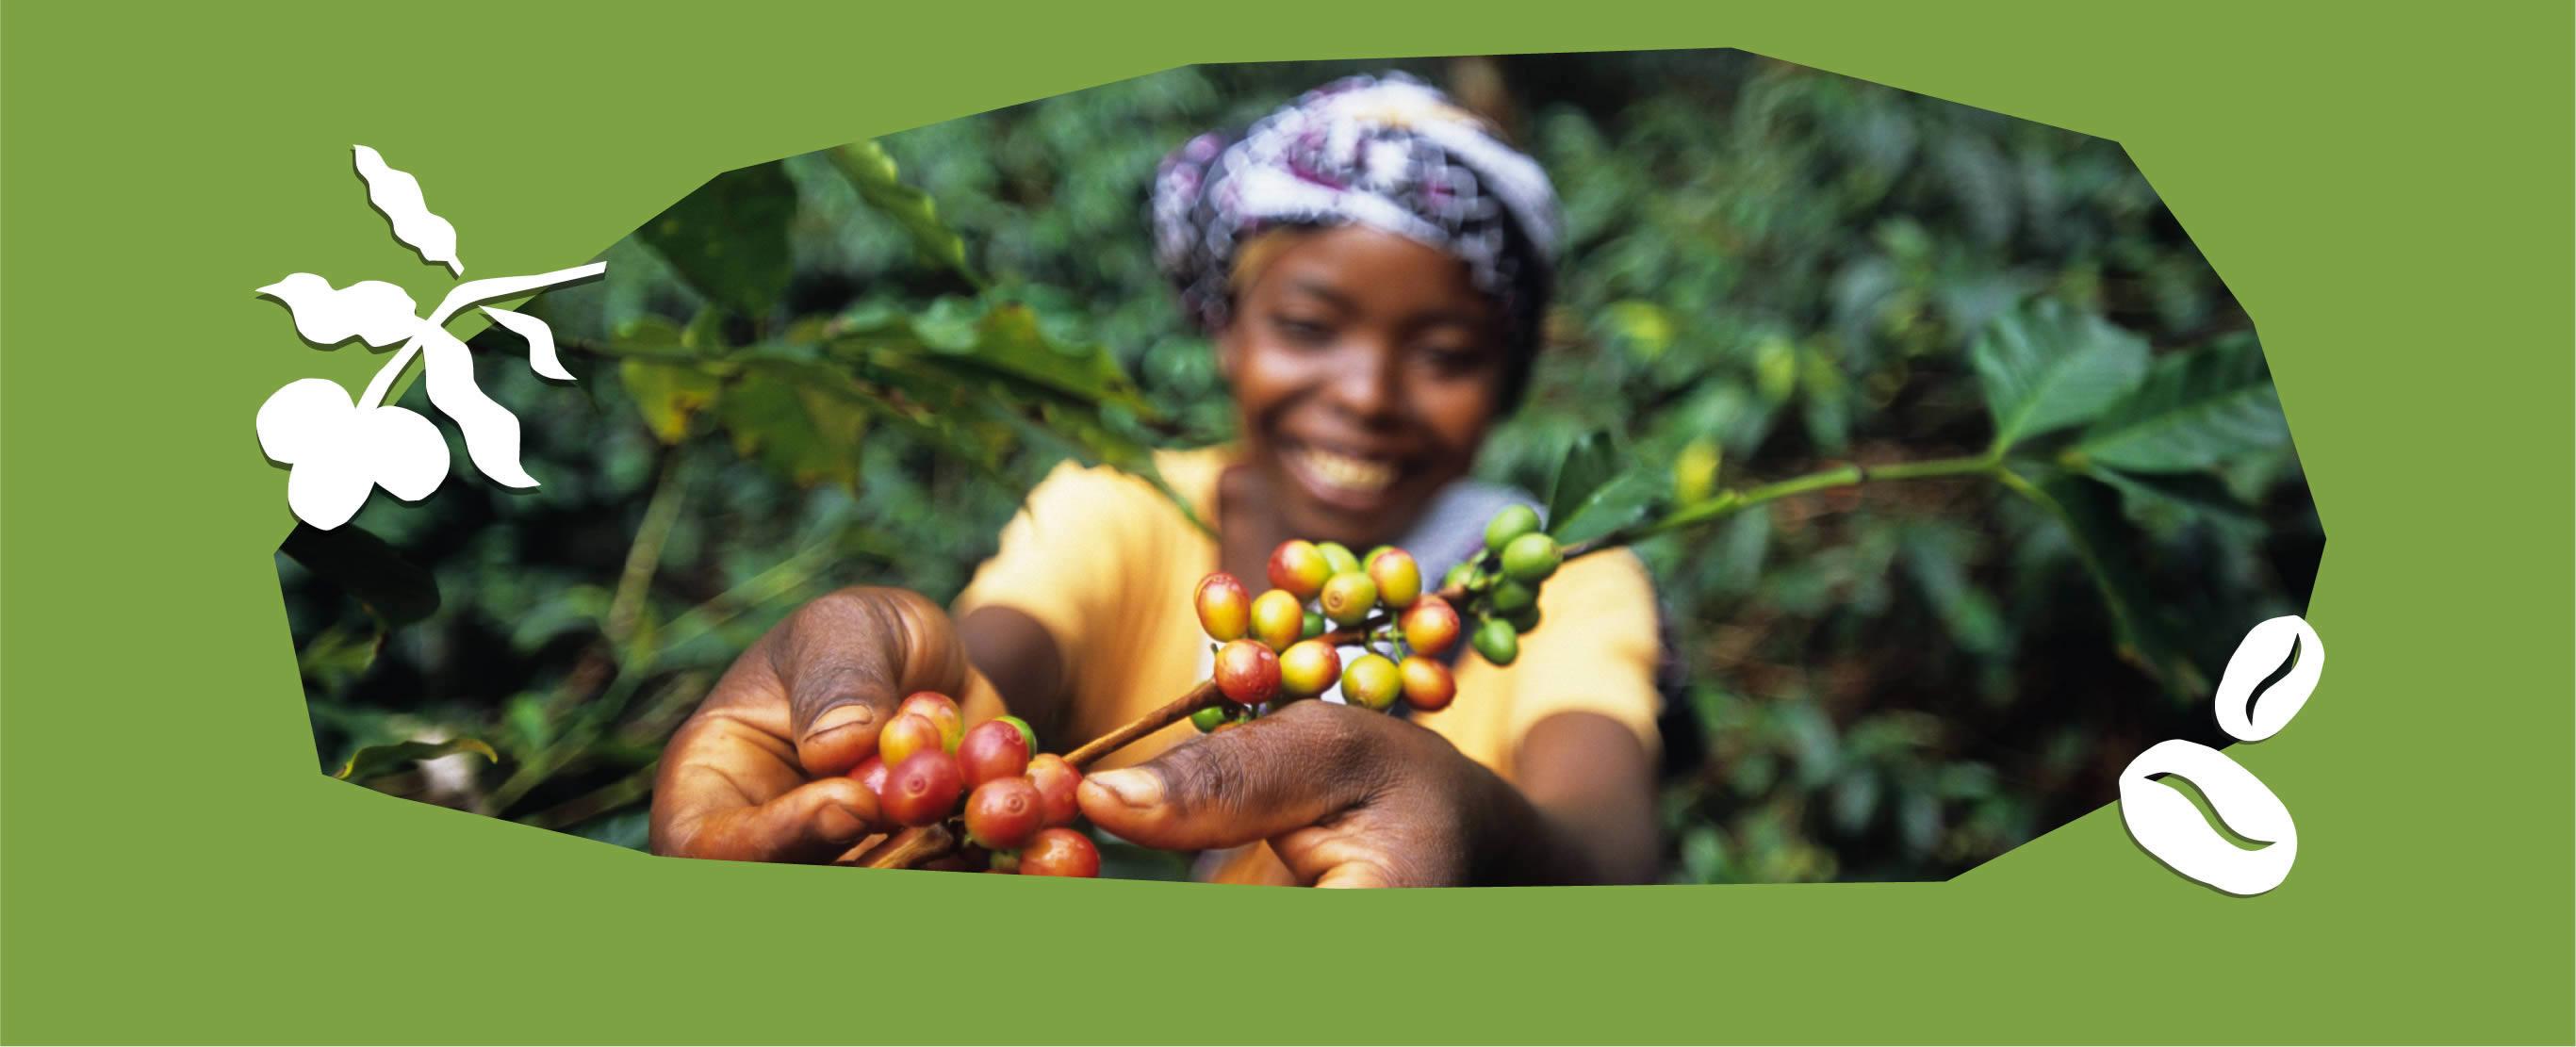 Fairtrade and organic